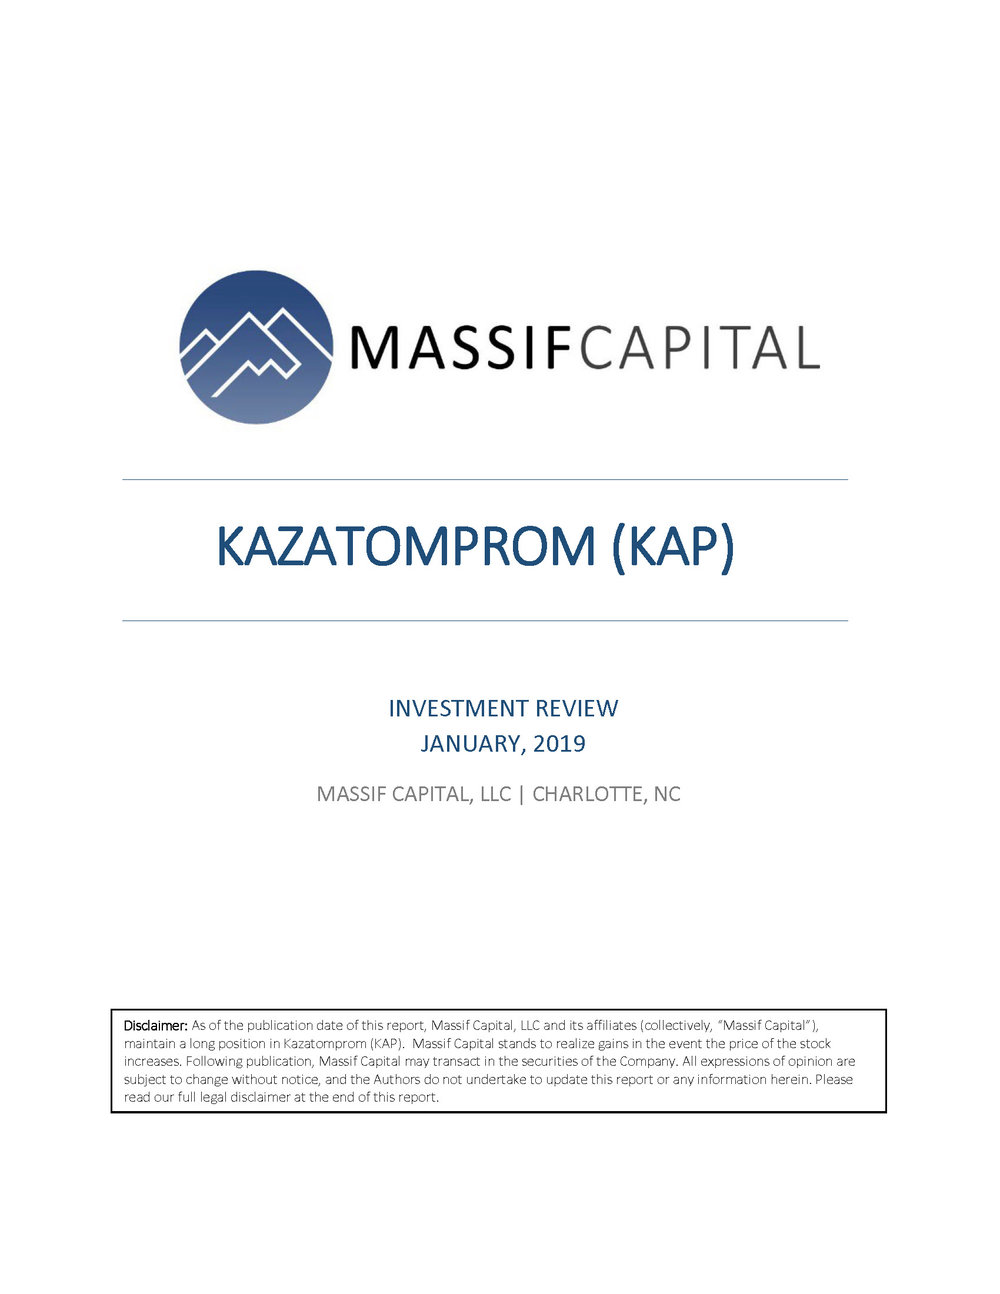 Initiating Report - KAP - January 2019 - Massif Capital_Page_01.jpg